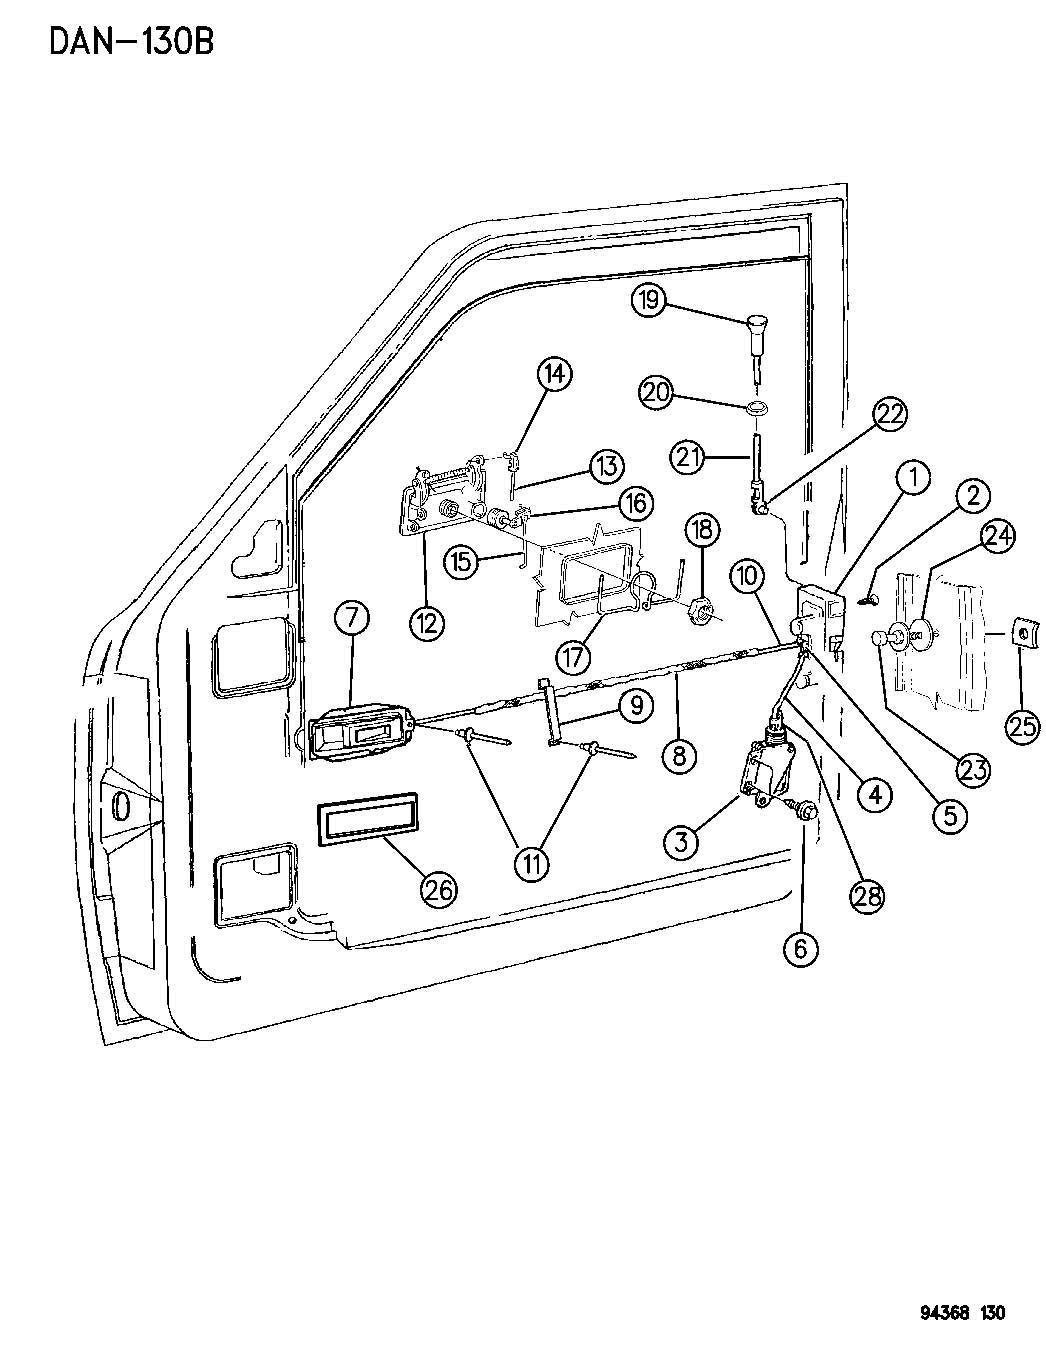 1995 dodge dakota wiring diagram msd ignition chevy 93 door handle free engine image